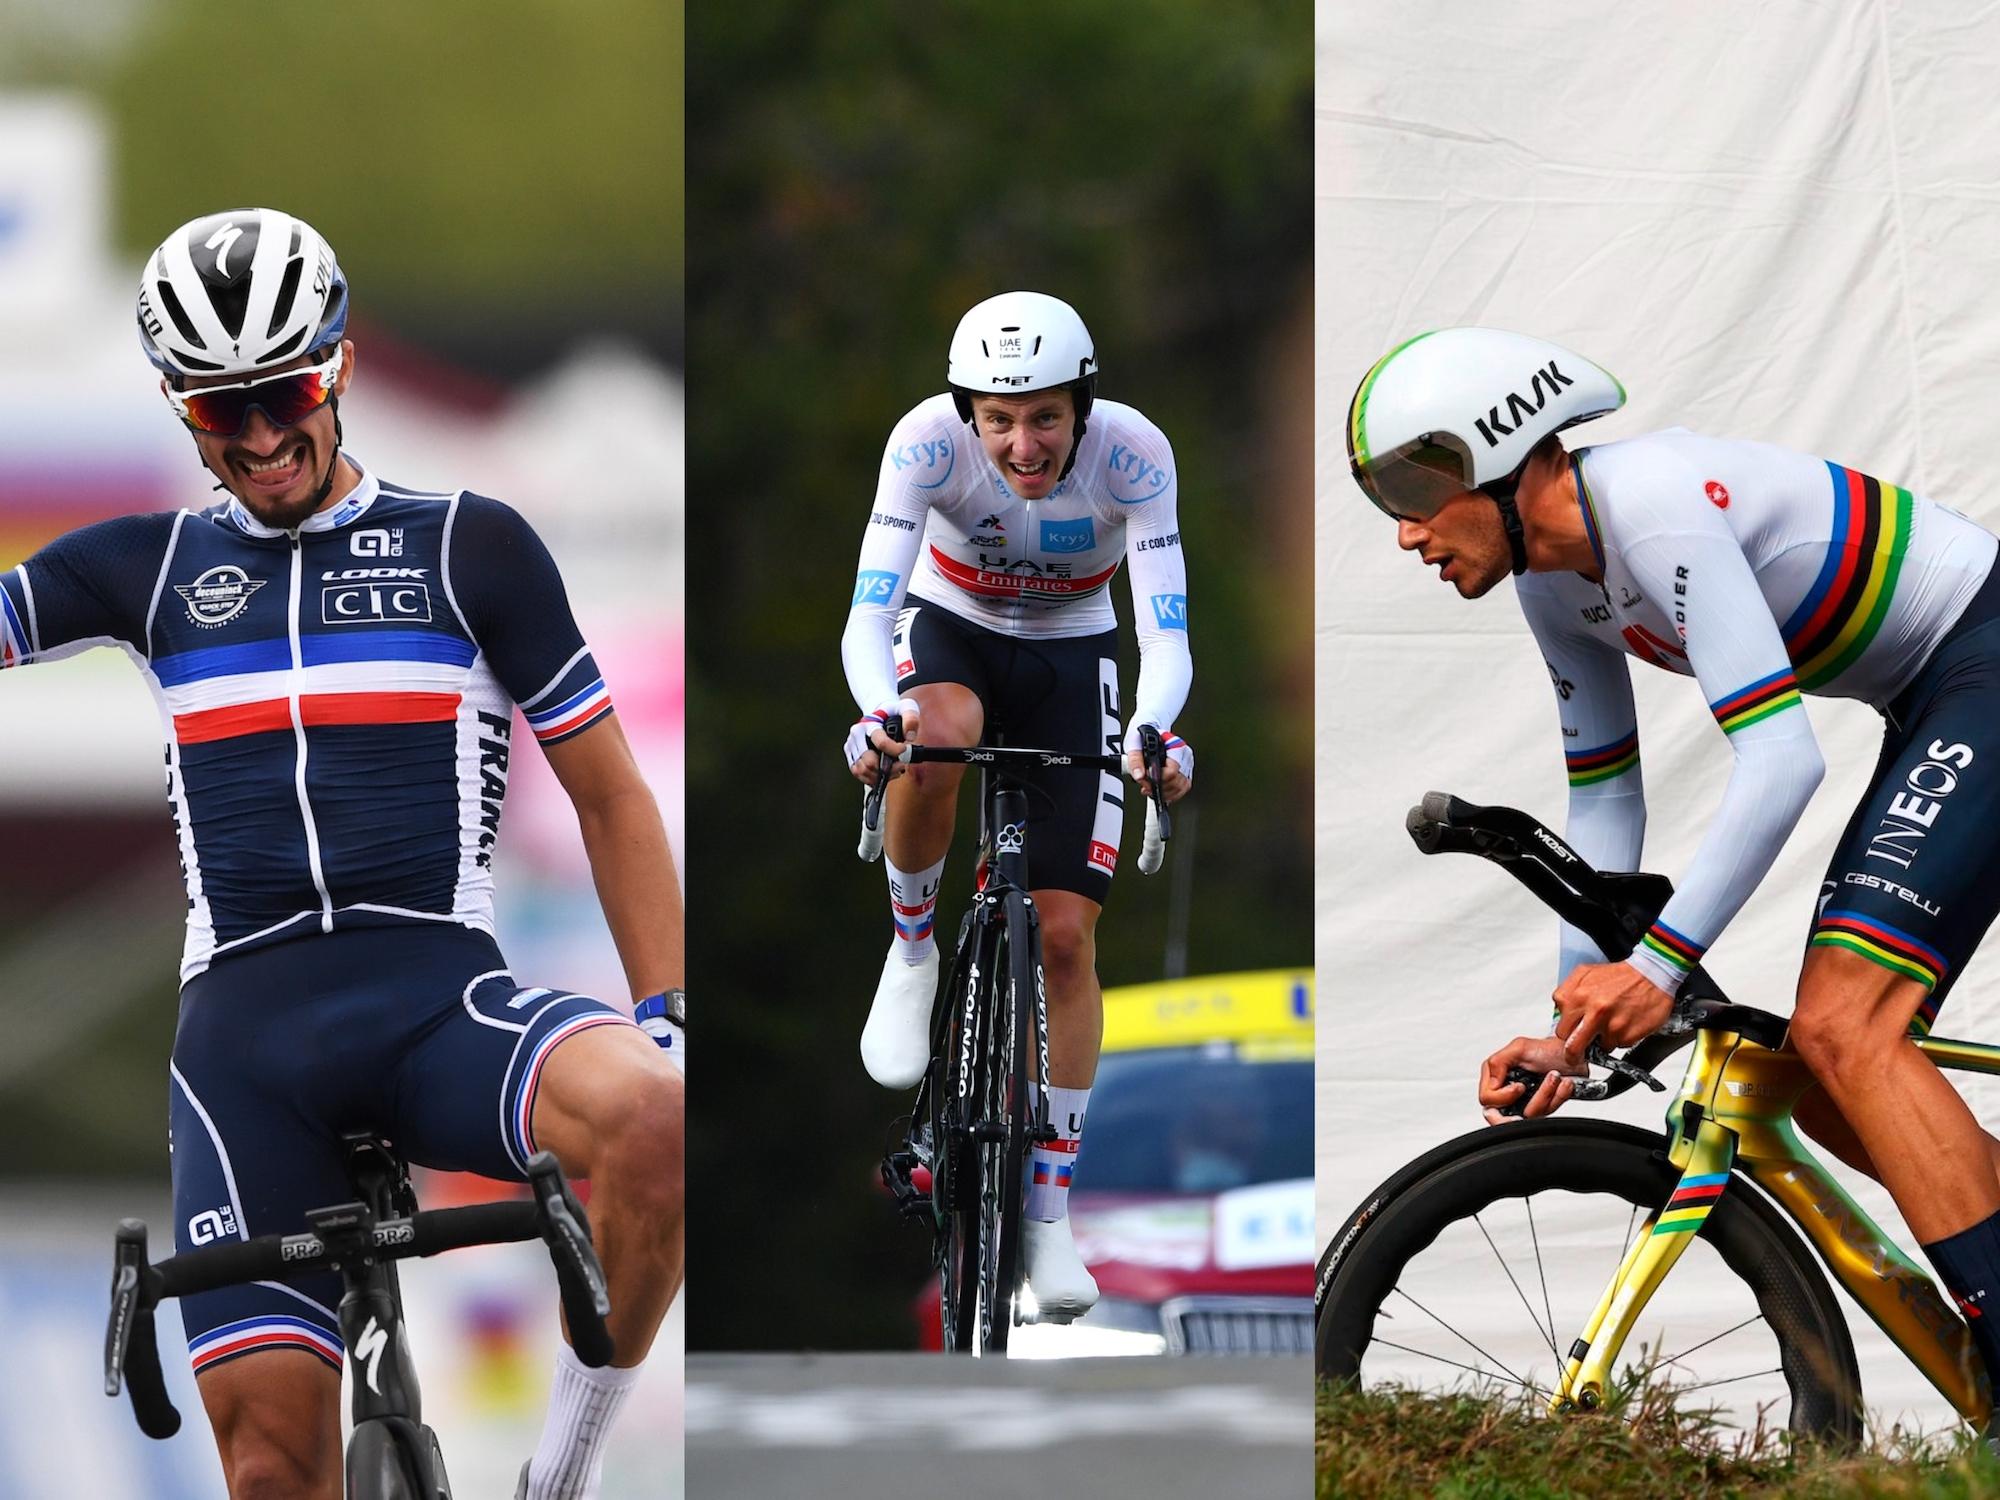 Top-10 performances of the 2020 men's road season